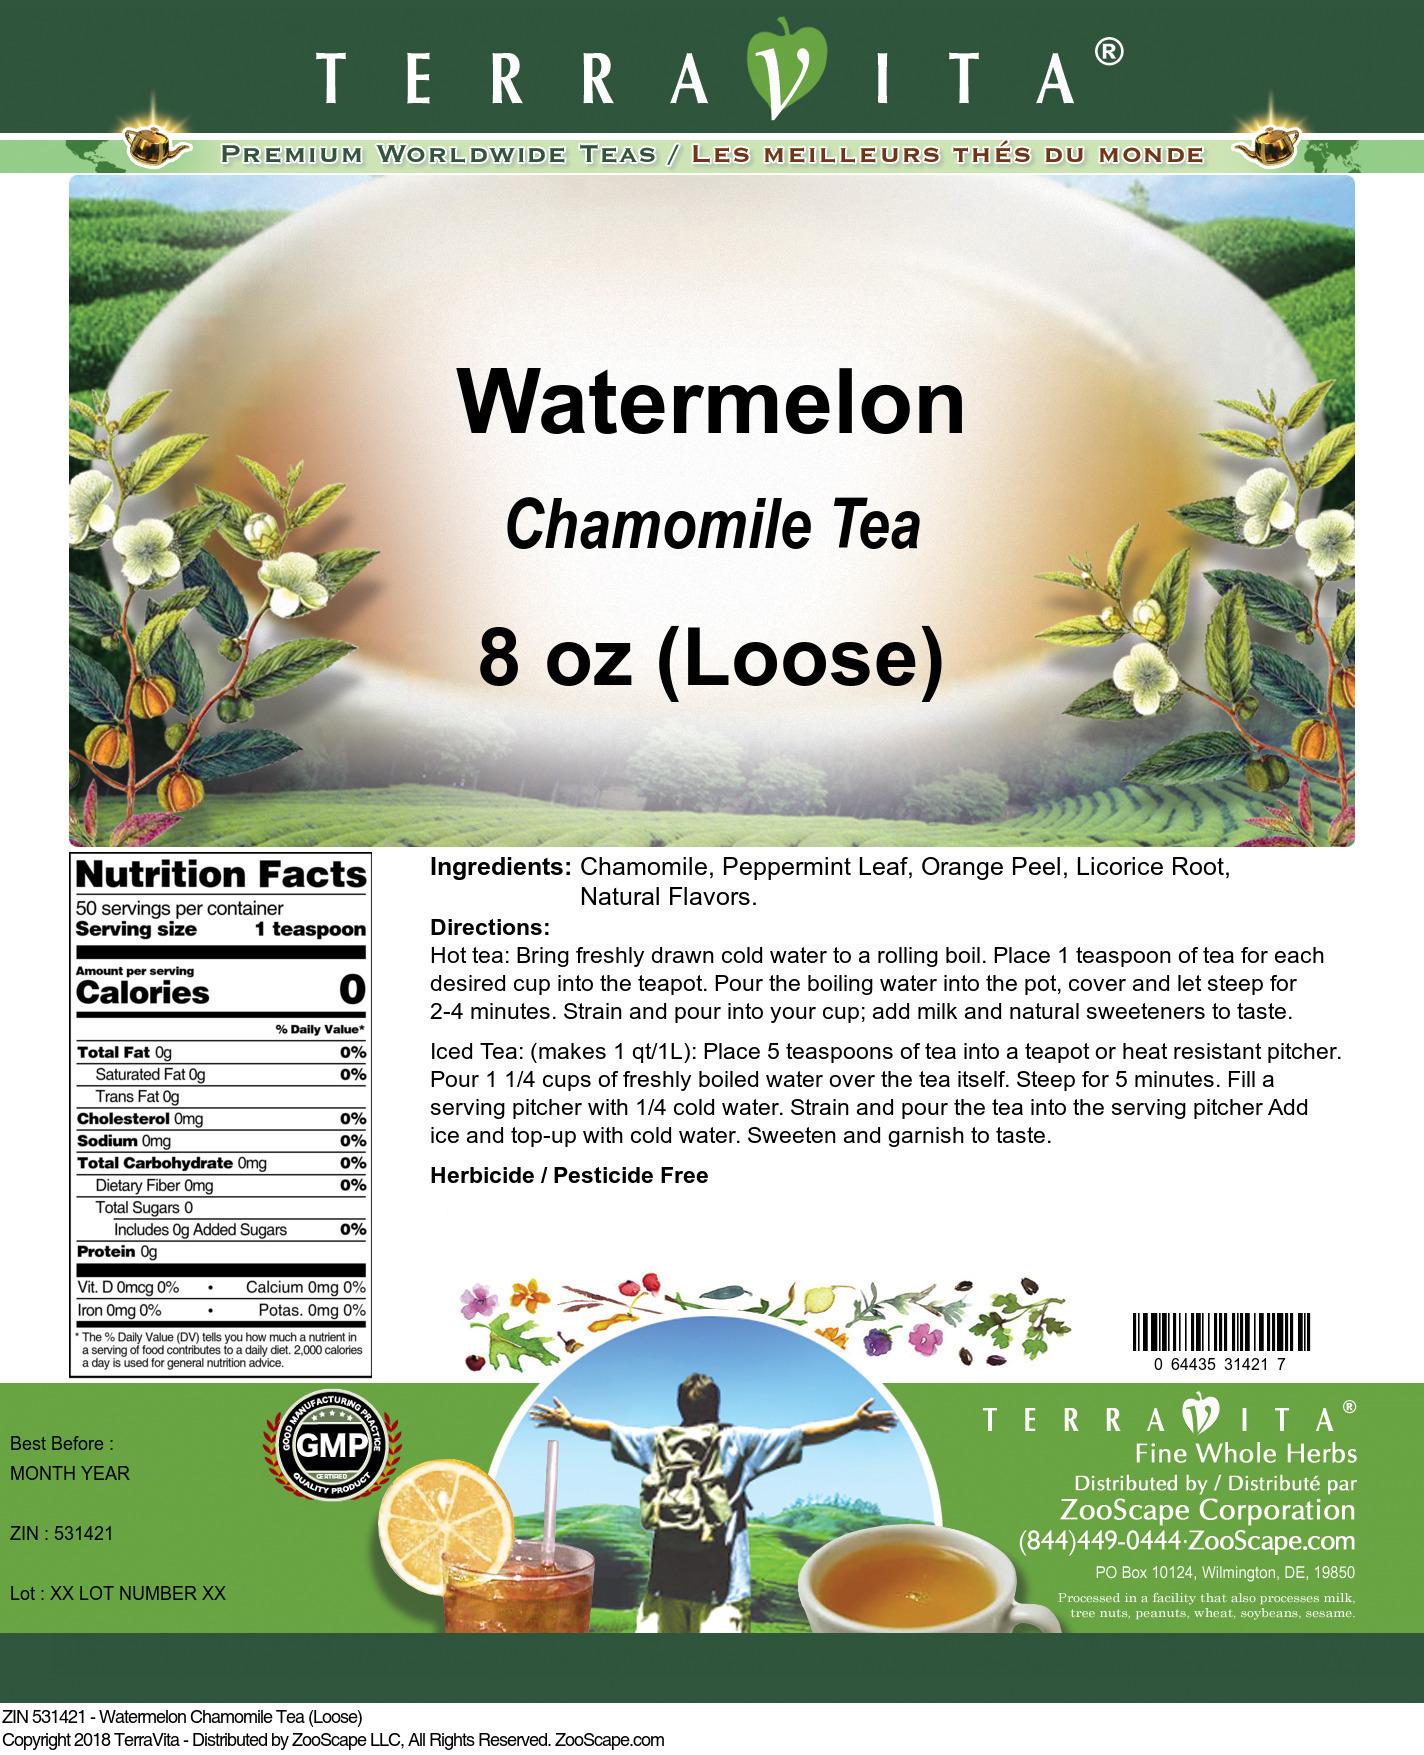 Watermelon Chamomile Tea (Loose)